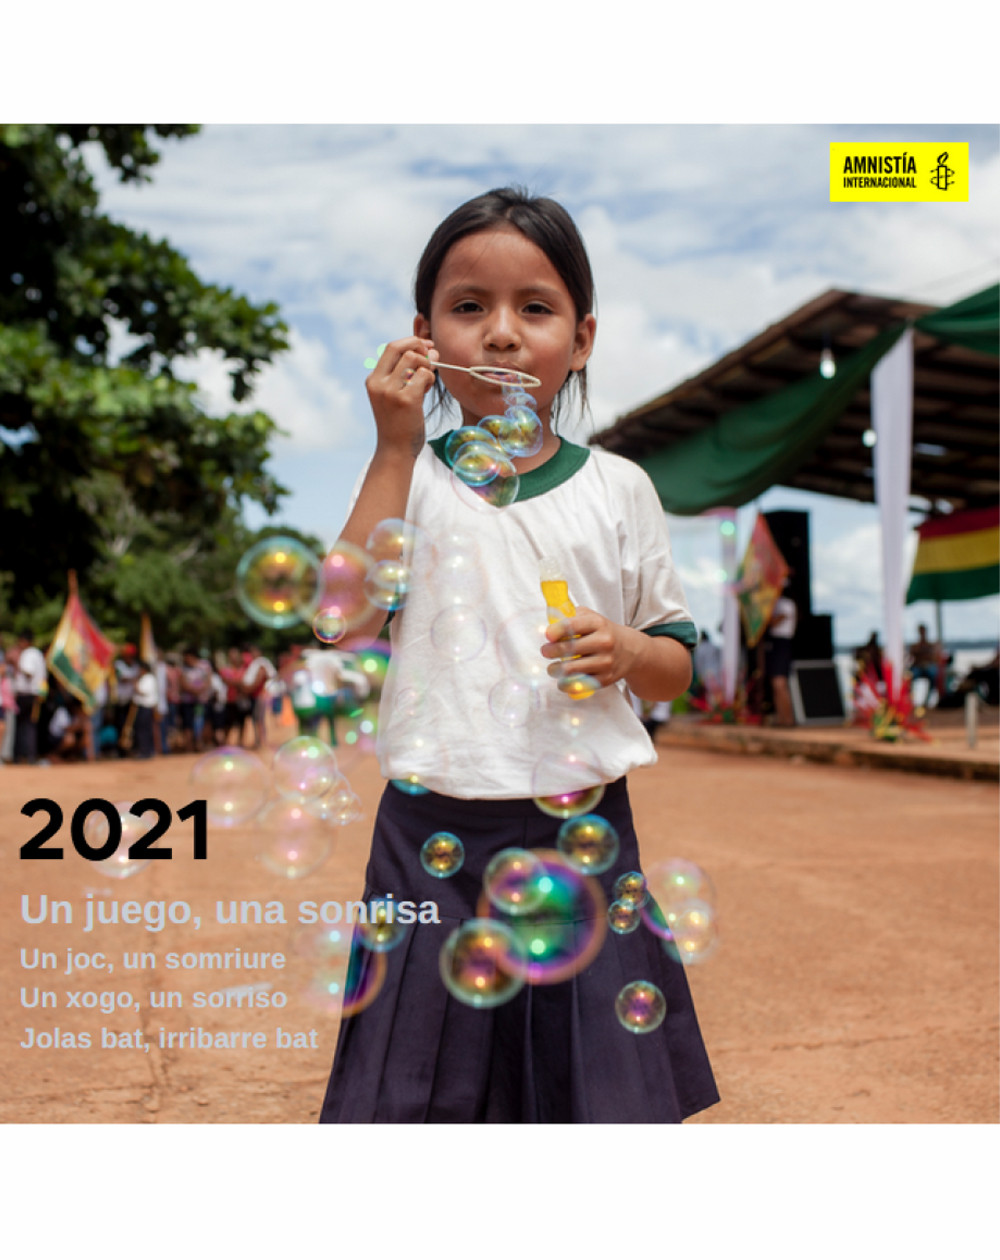 Calendario solidario 2021 Amnistía Internacional